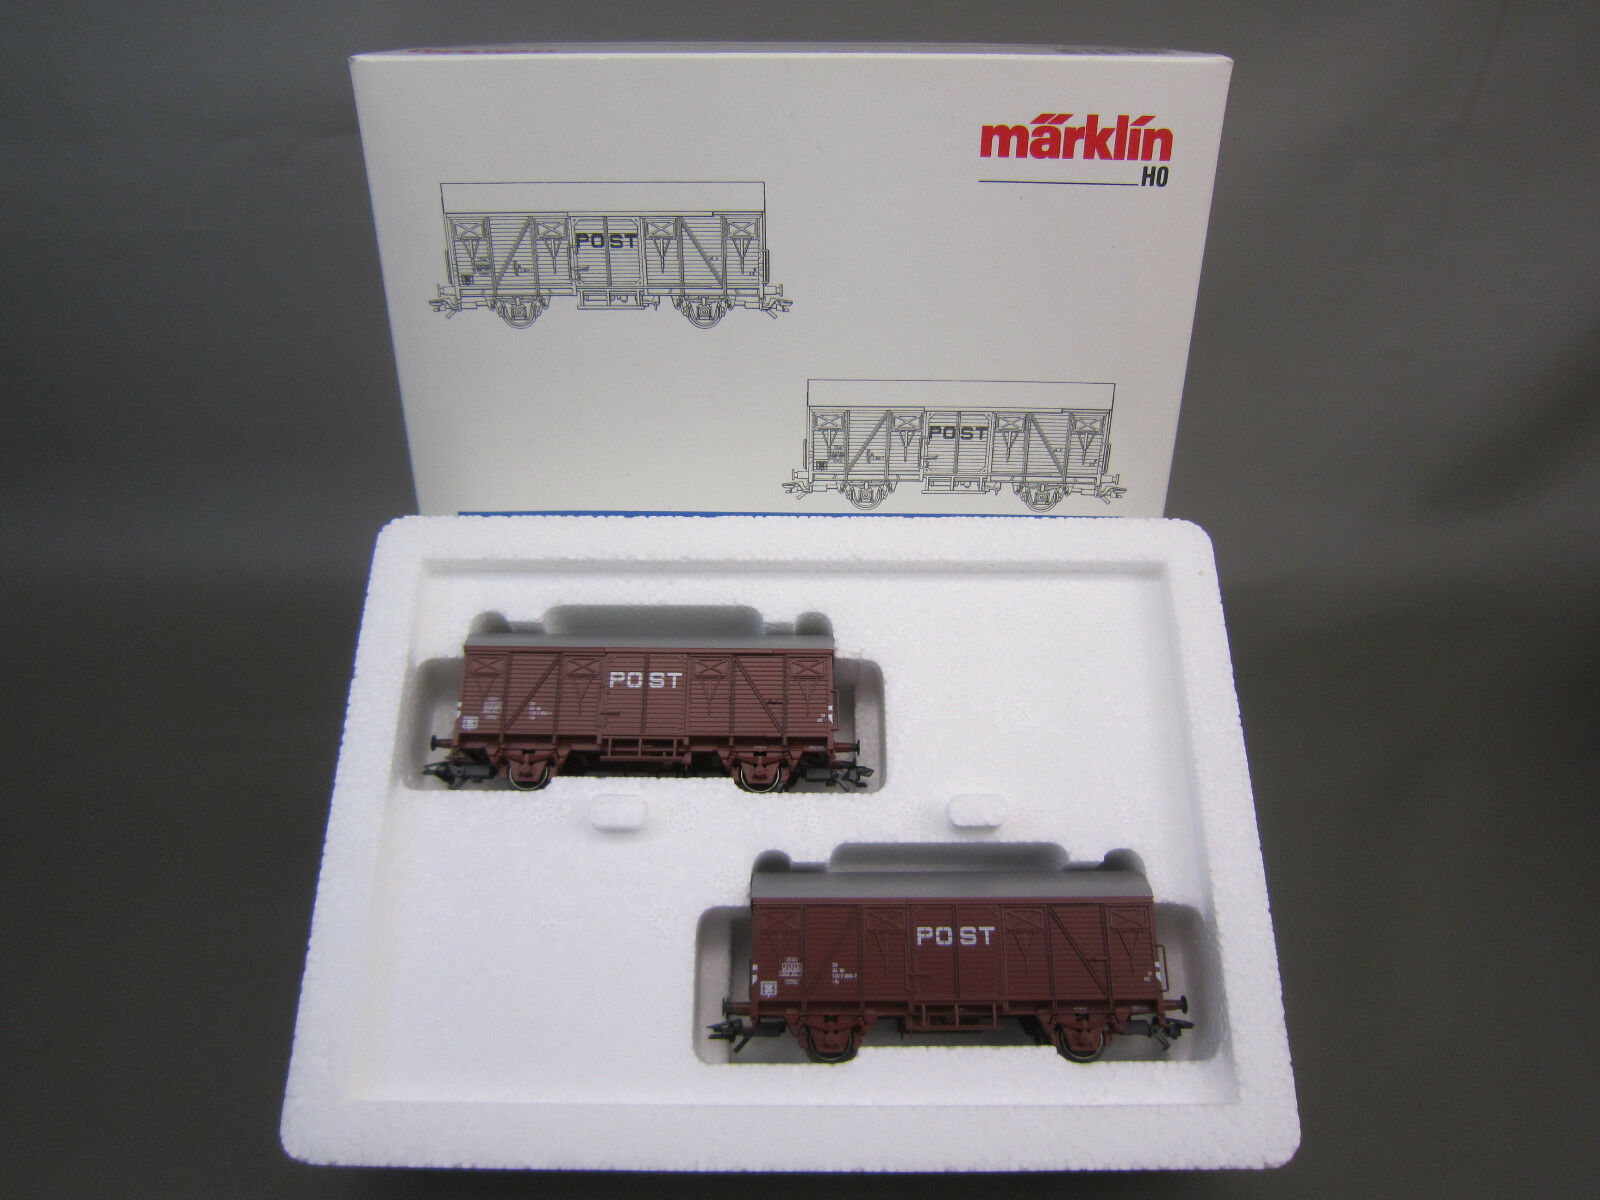 Marklin HO Scale 46271 NS Conjunto De Coche de Cochega mercancías cubierto de Post